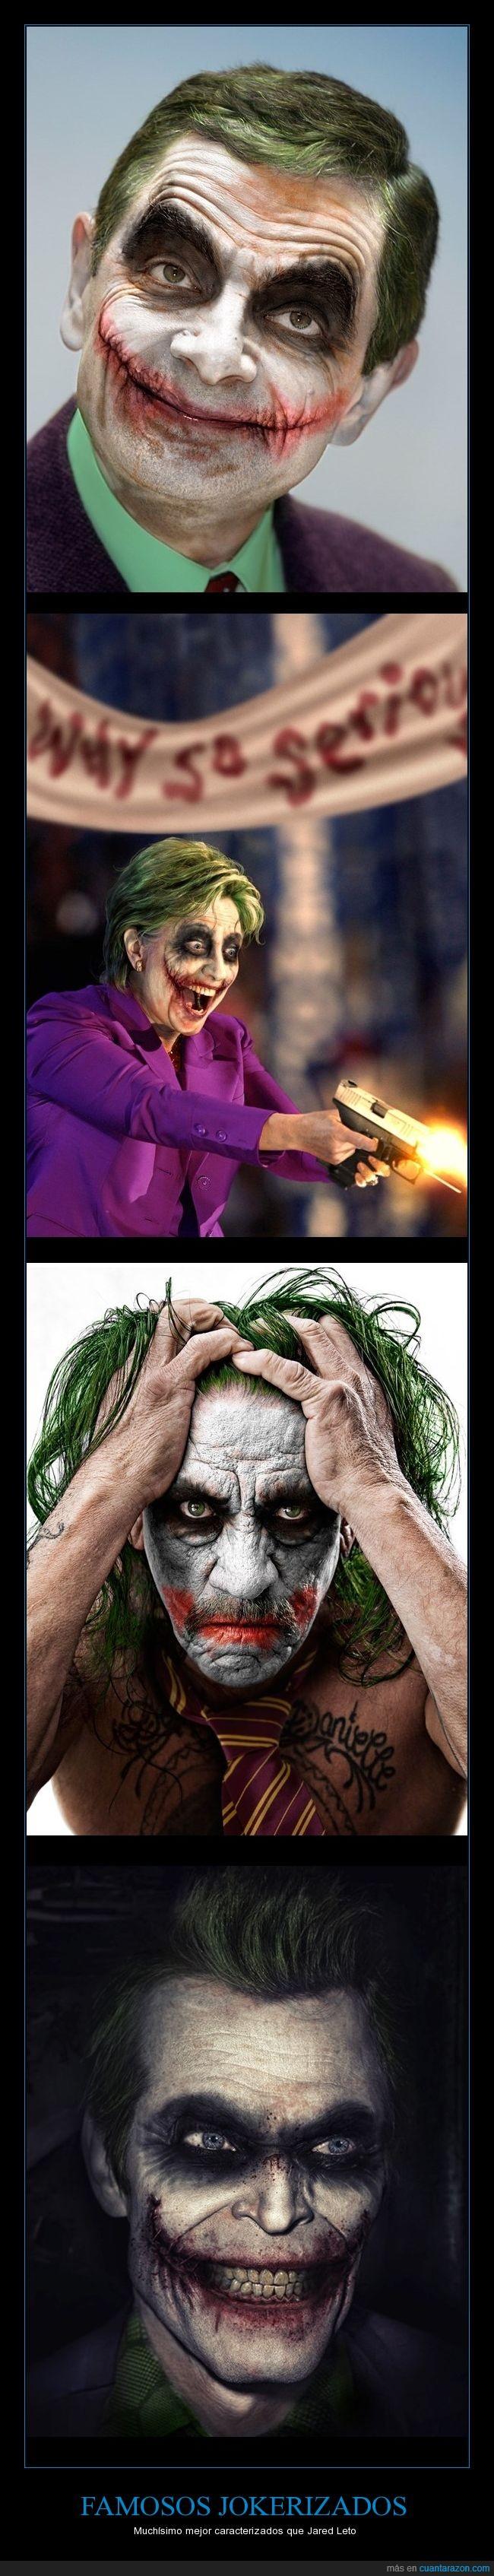 Batman,famosos,Jared Leto,Joker,maquillaje,photoshop